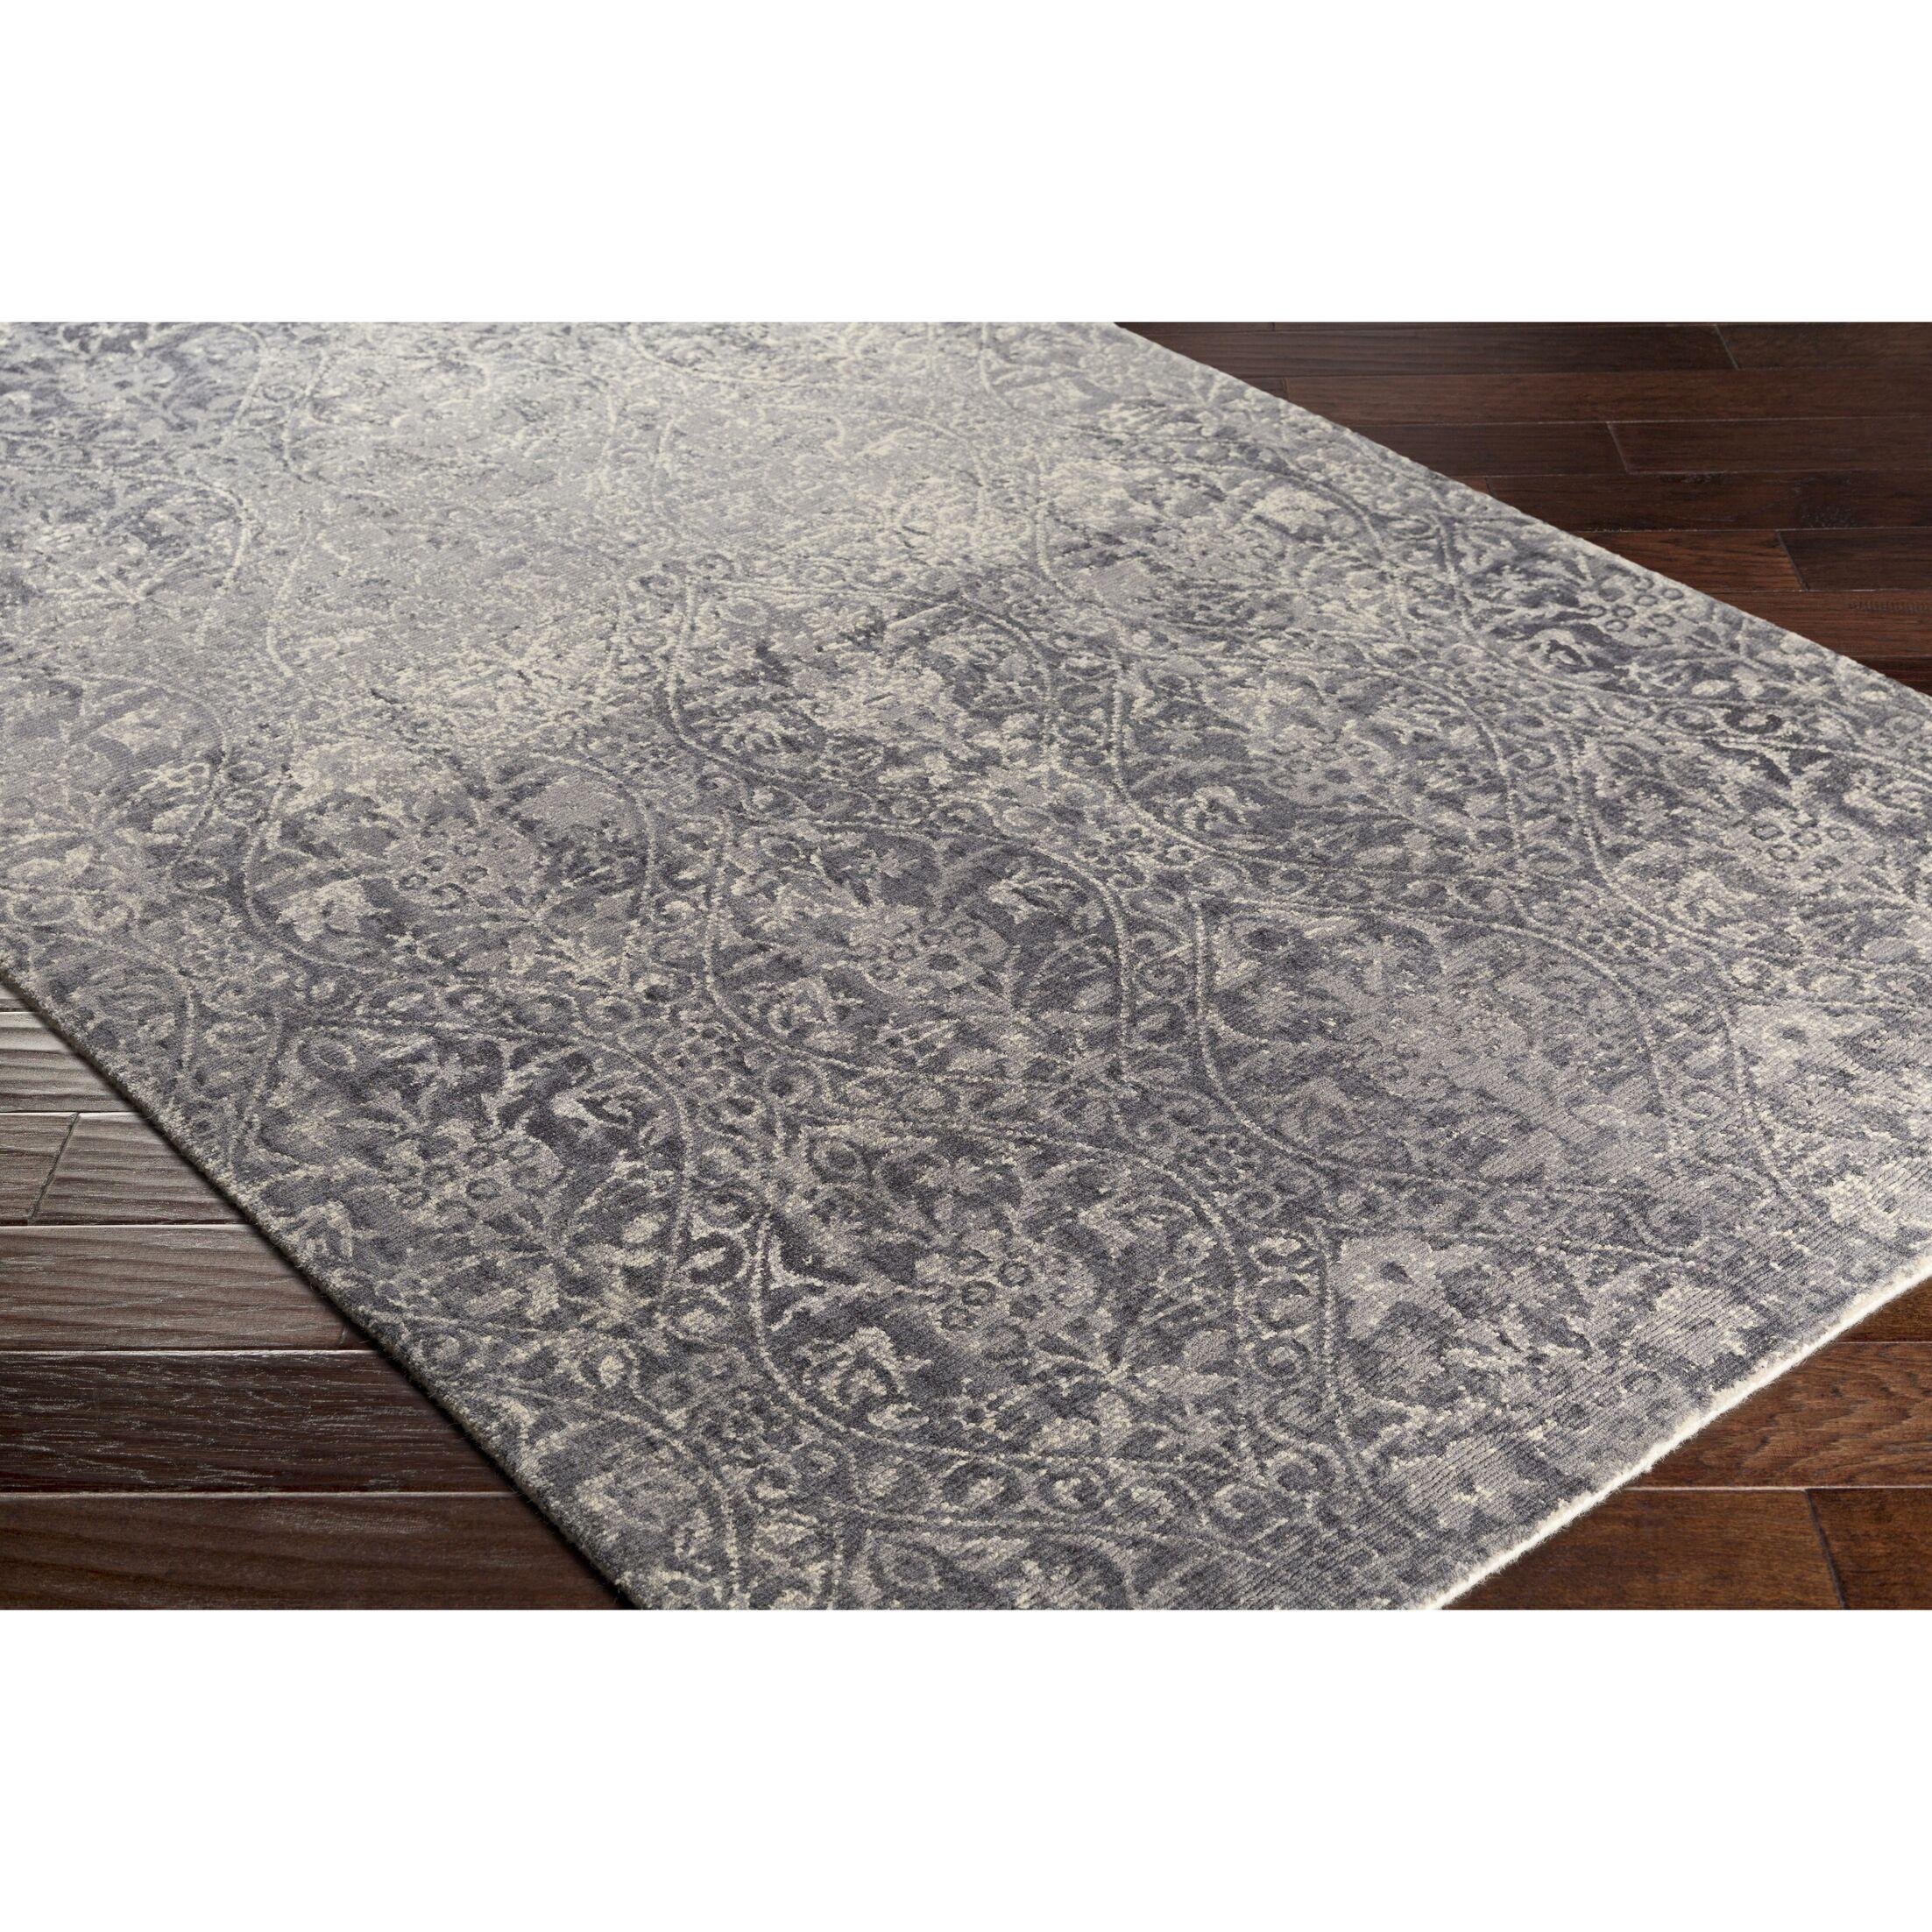 Anselma Hand-Loomed Neutral/Gray Area Rug Rug Size: Rectangle 8' x 10'